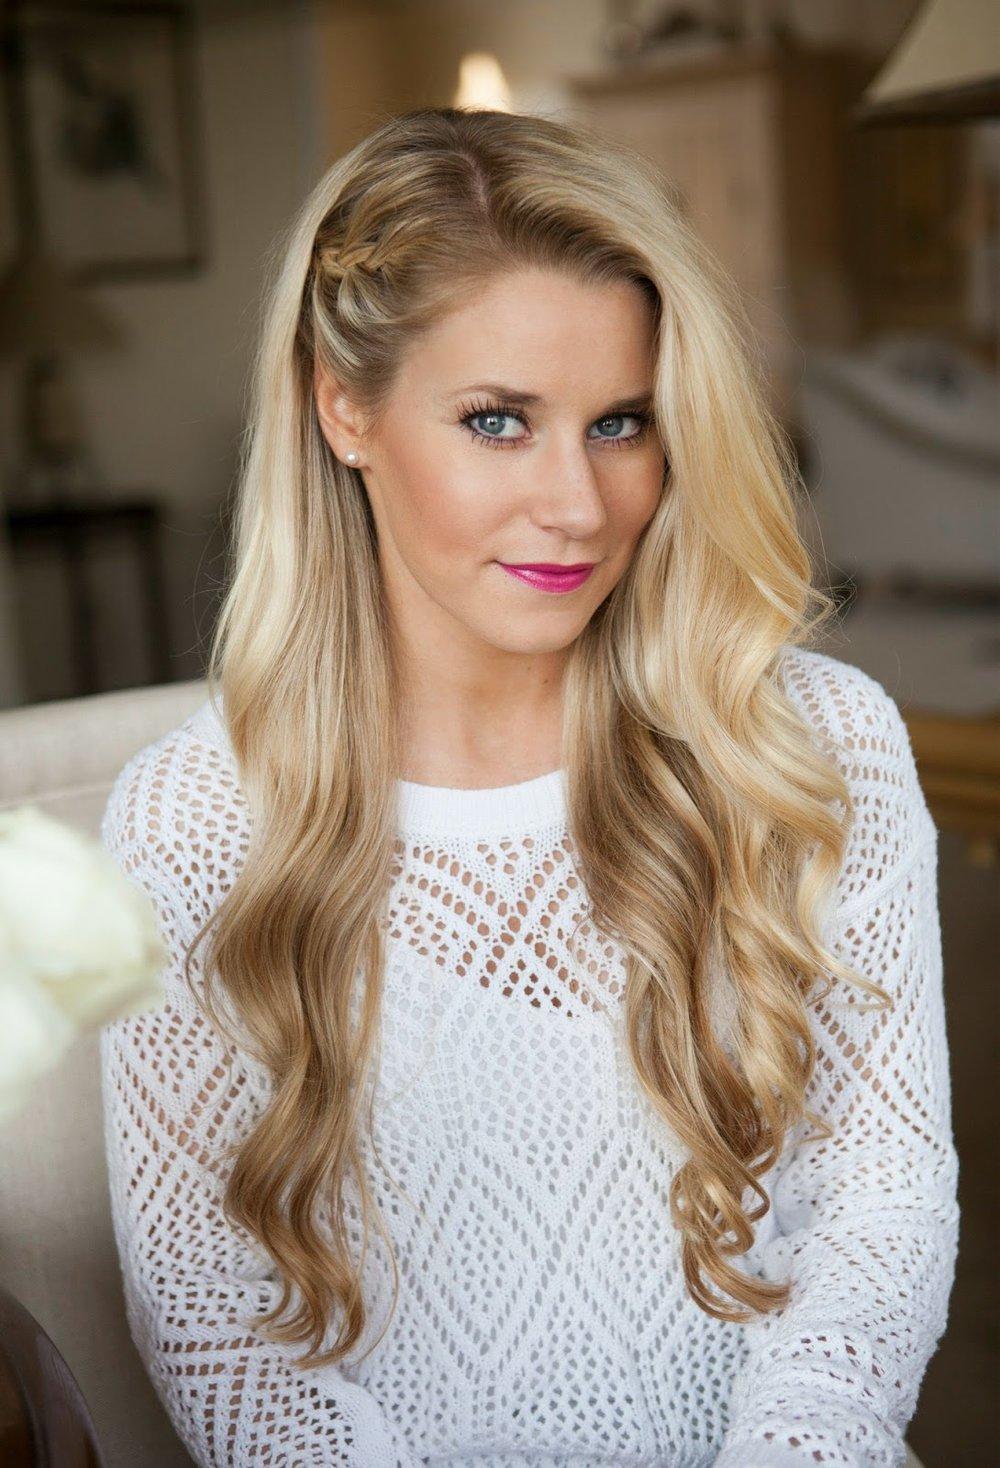 wear-hair-down-wedding-guest-hair-style-beauty-blonde-wavy-side-braid-long.jpg